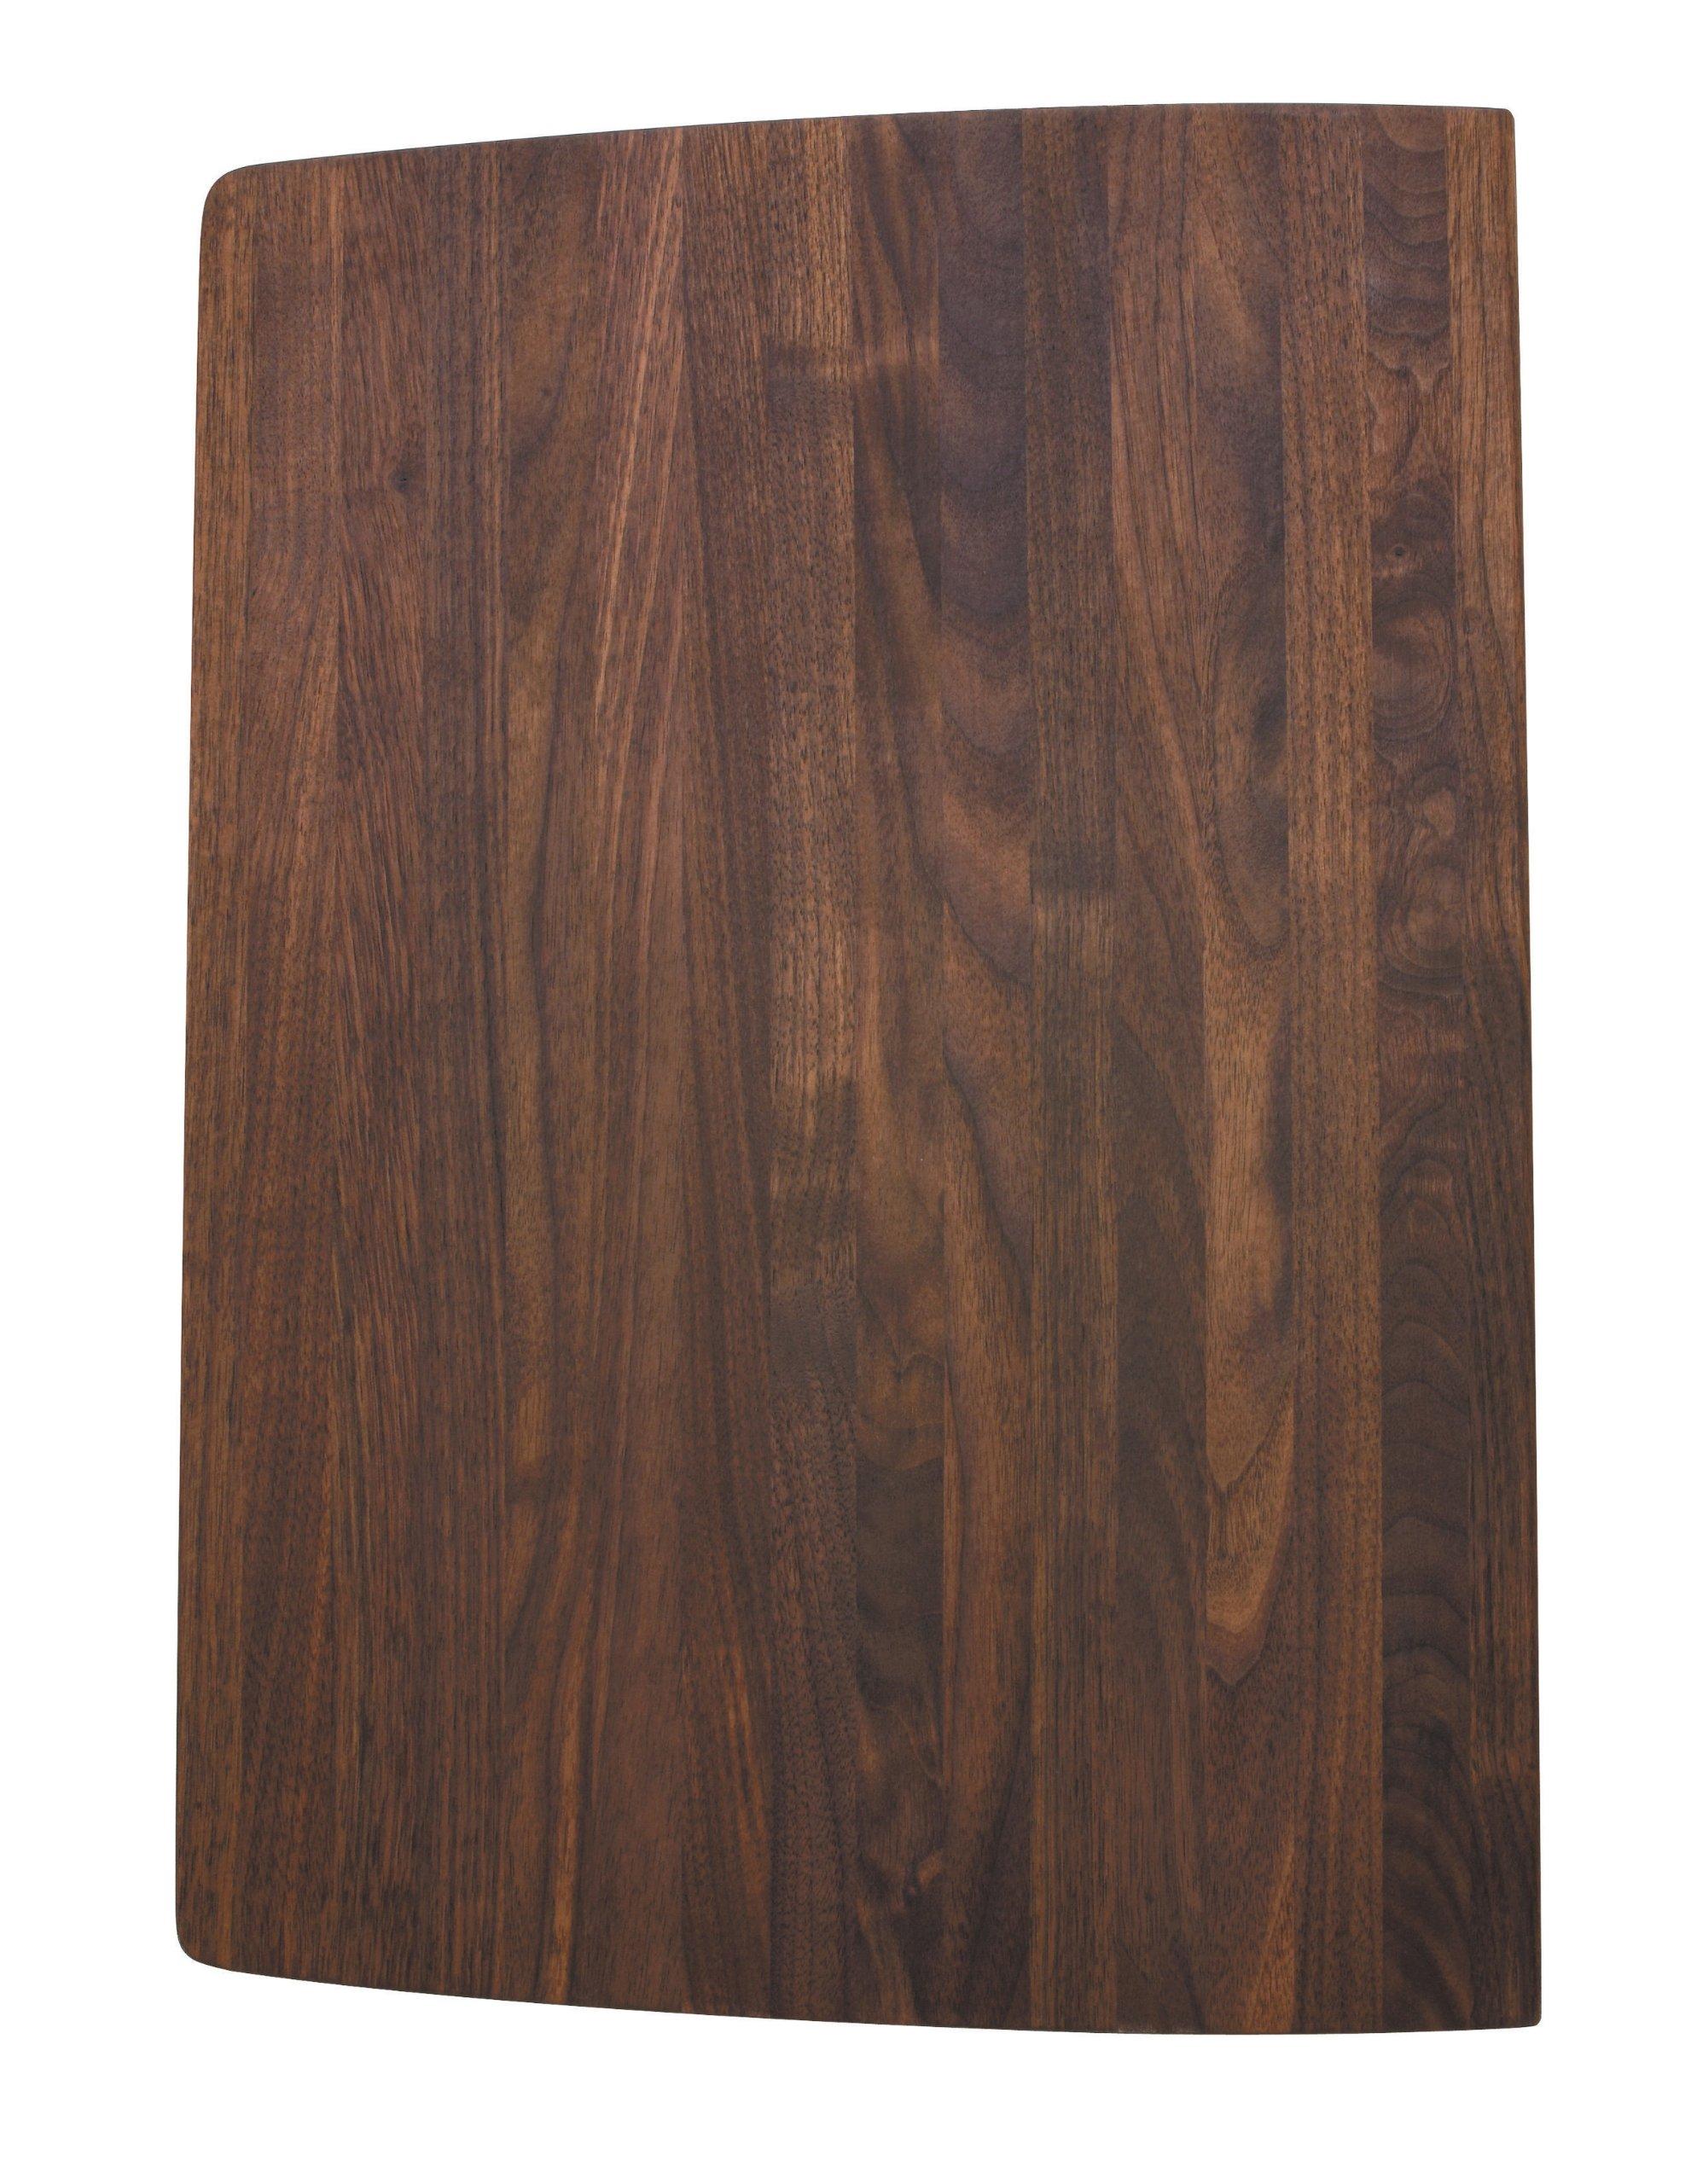 Blanco 222587 Wood Cutting Board, Fits Performa Silgranit II Equal Double Bowl, Walnut